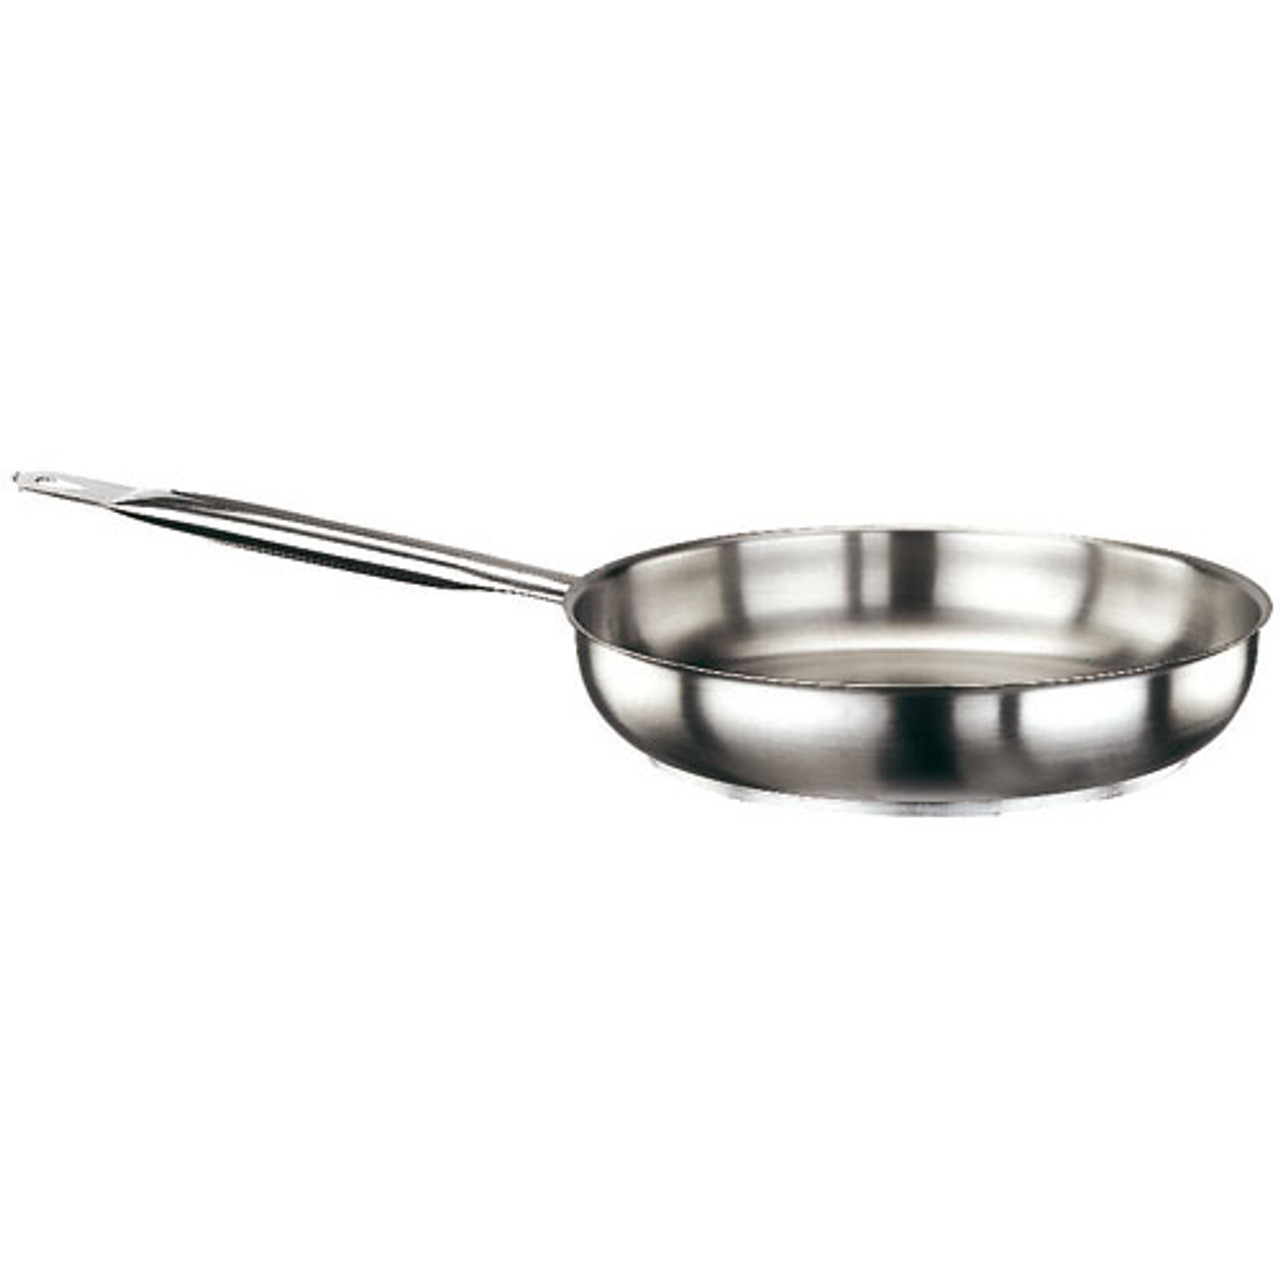 "Frying Pan, S/S R, DIA 11"" X H 2 1/8"""